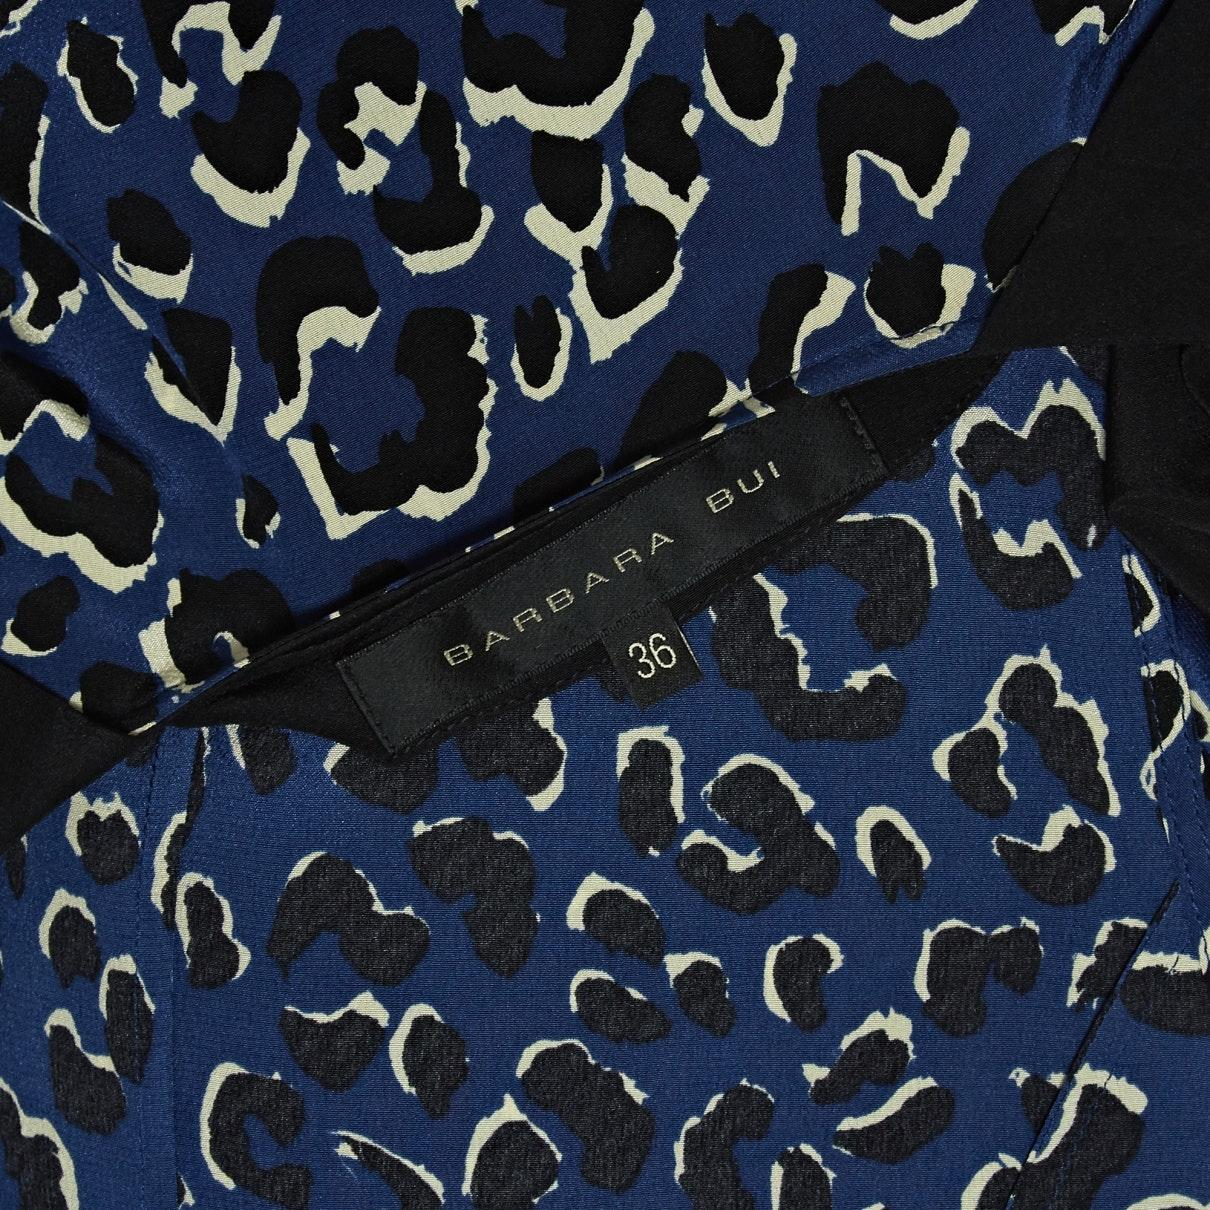 Combinaisons N en Soie Bleu Soie Barbara Bui en coloris Bleu